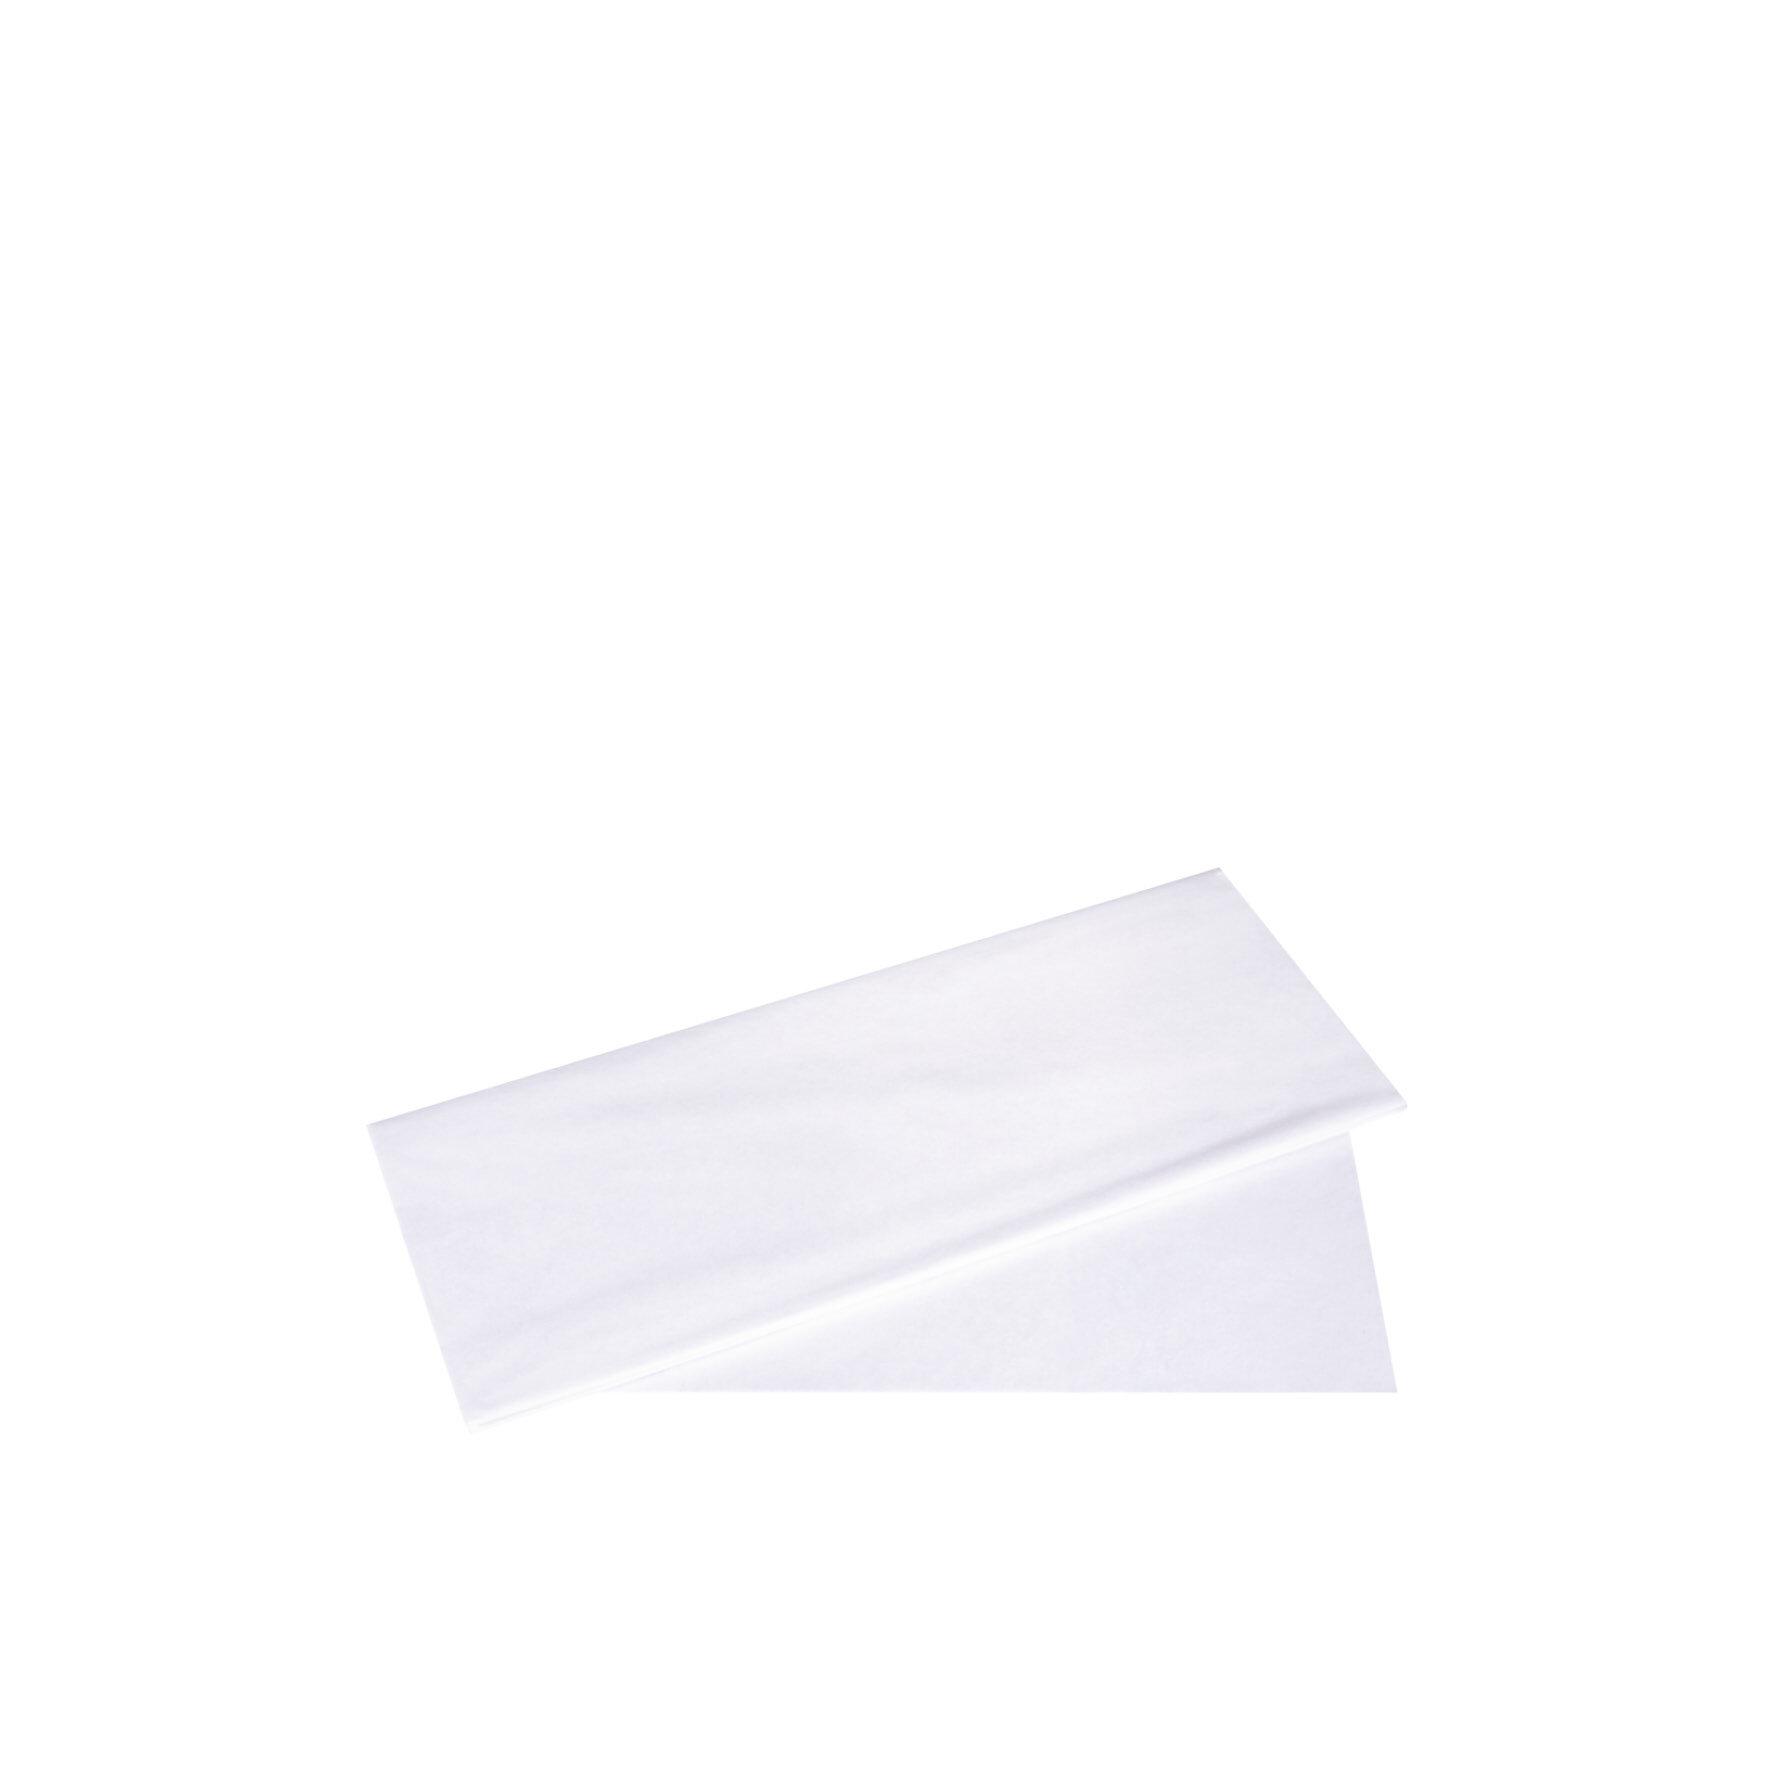 WEBAwrap  Wachs-Seidenpapier    Papier mit Beschichtung aus Wachs, kompostierbar